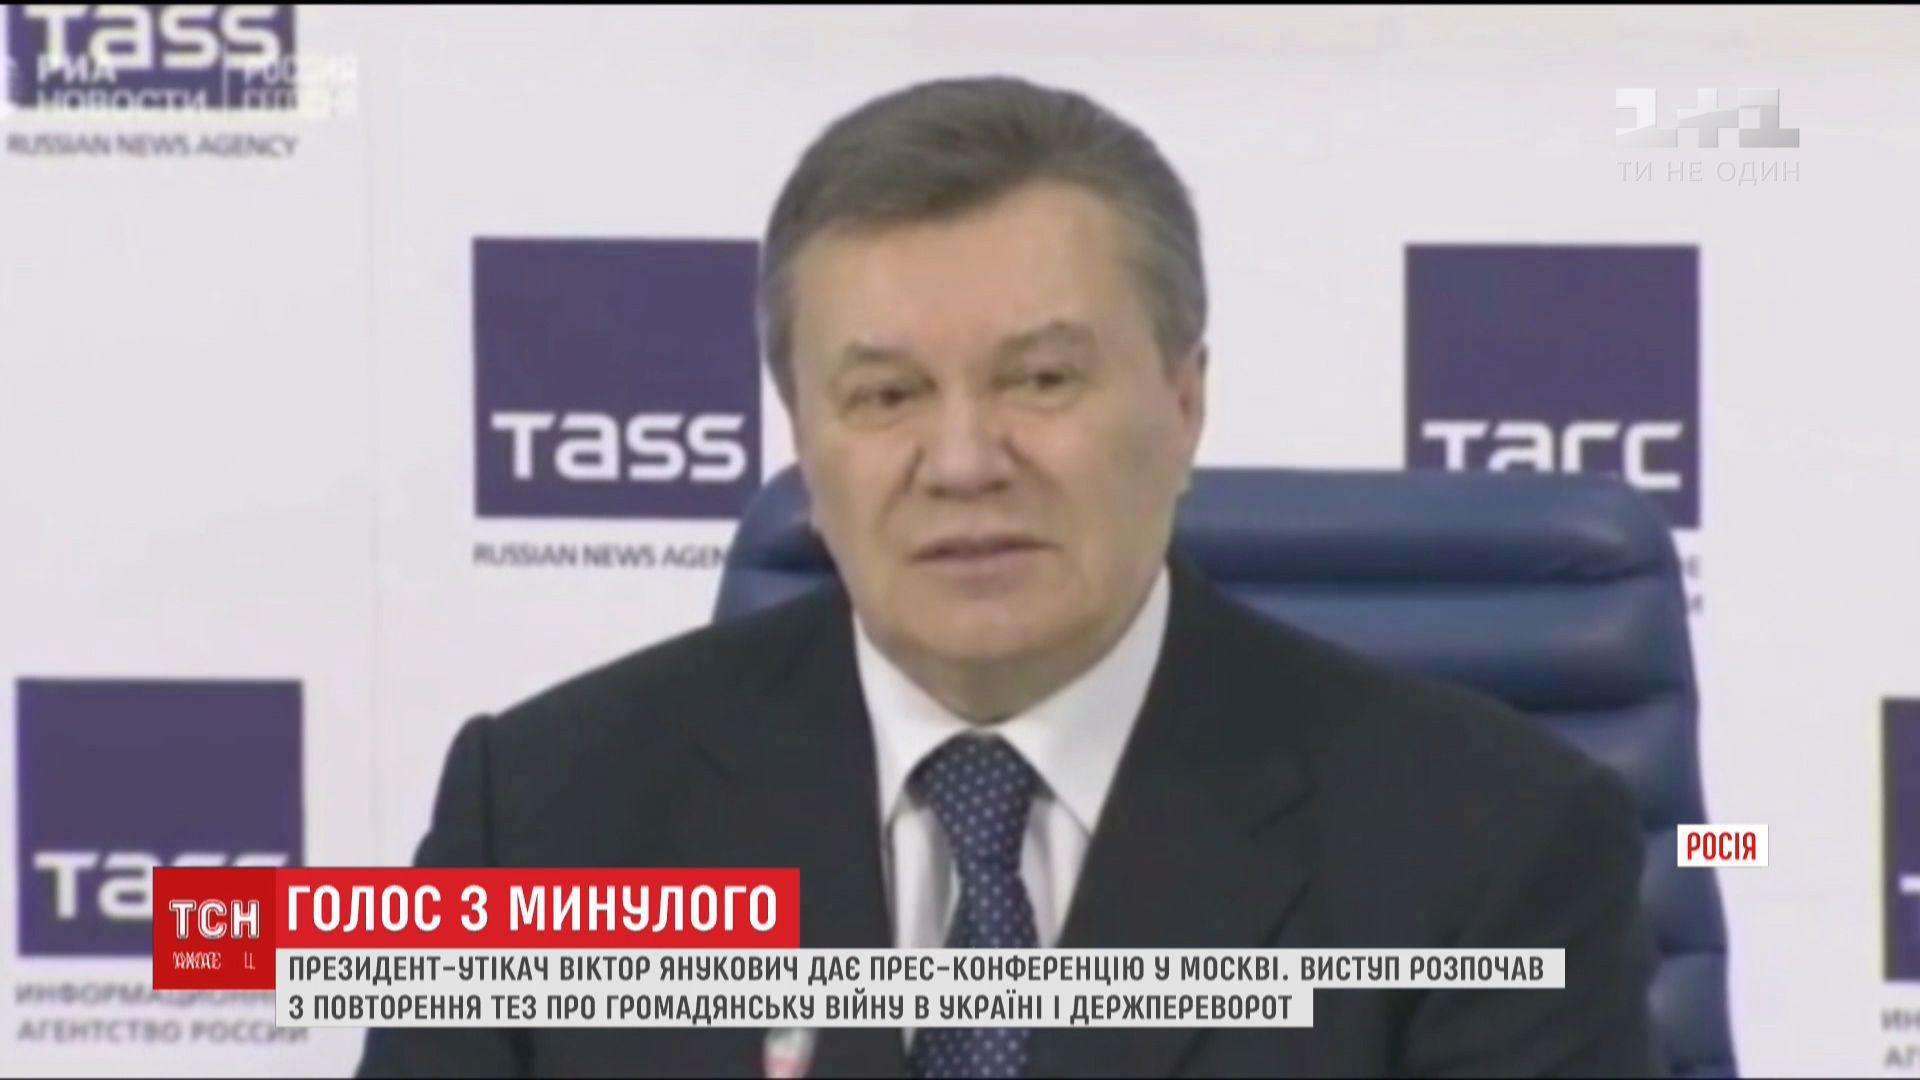 Картинки по запросу . Пресс-конференция Виктора Януковича в Москве 02.03.18.